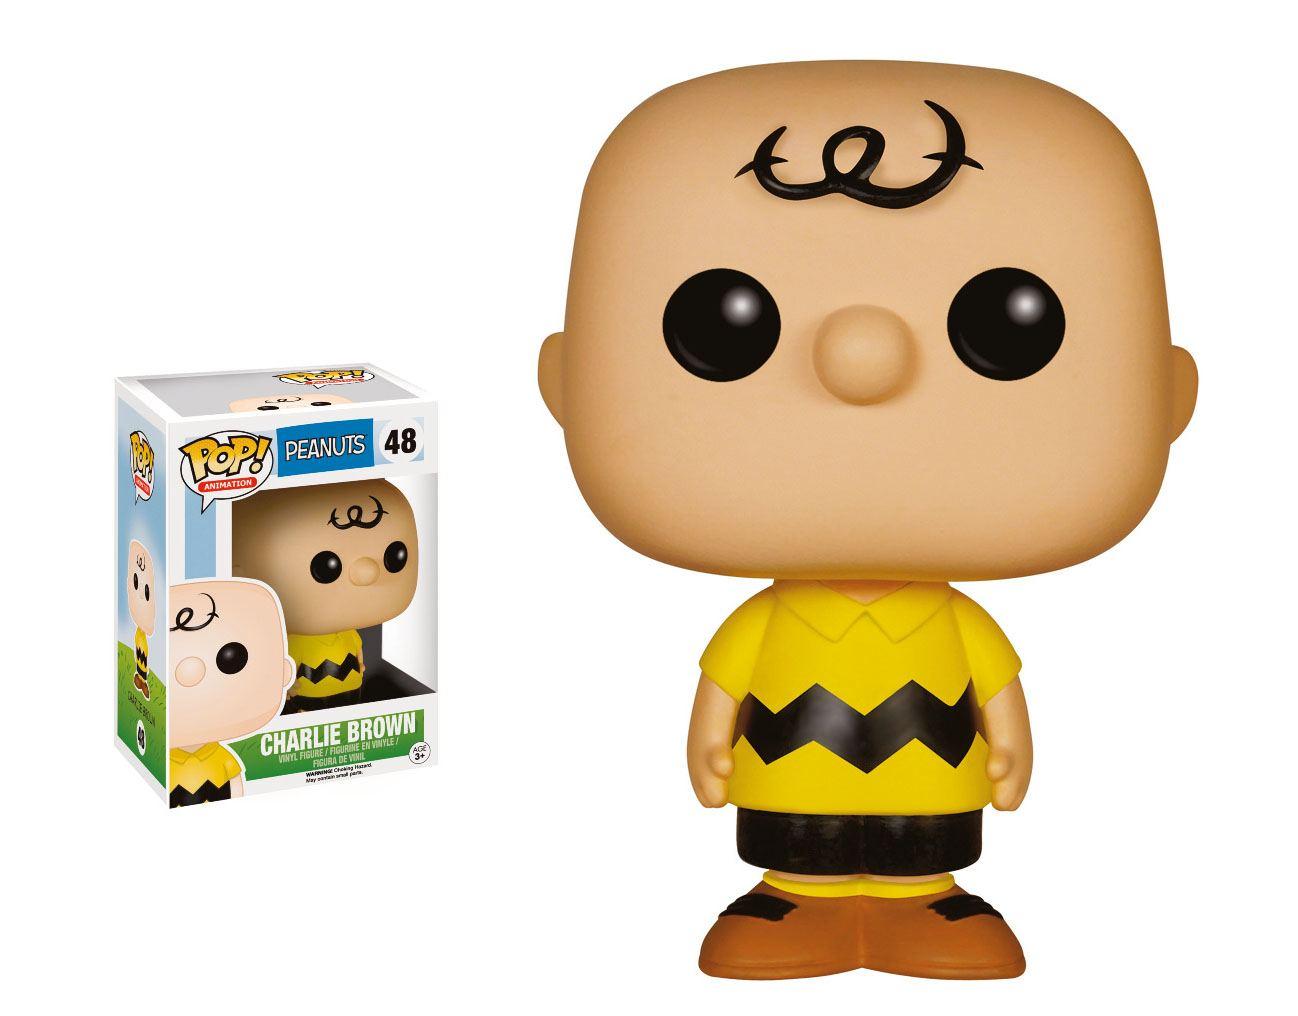 Peanuts POP! Animation Vinyl Figure Charlie Brown 9 cm